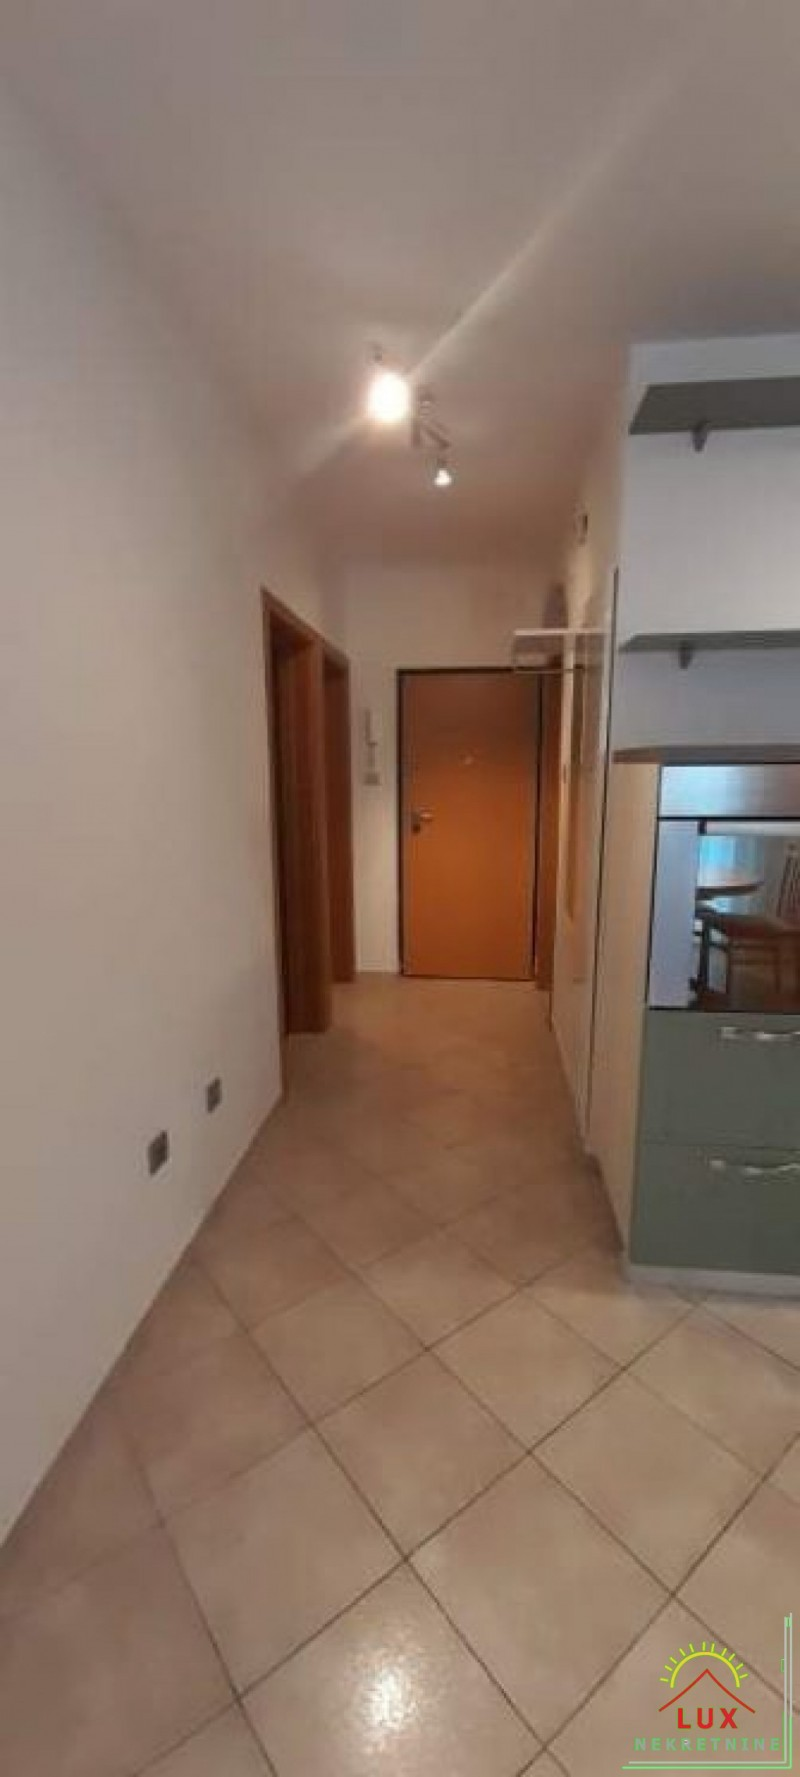 stan-u-zgradi-bez-lifta-pov-56-m2-dvosoban-zadar-vostarnica-9.jpeg